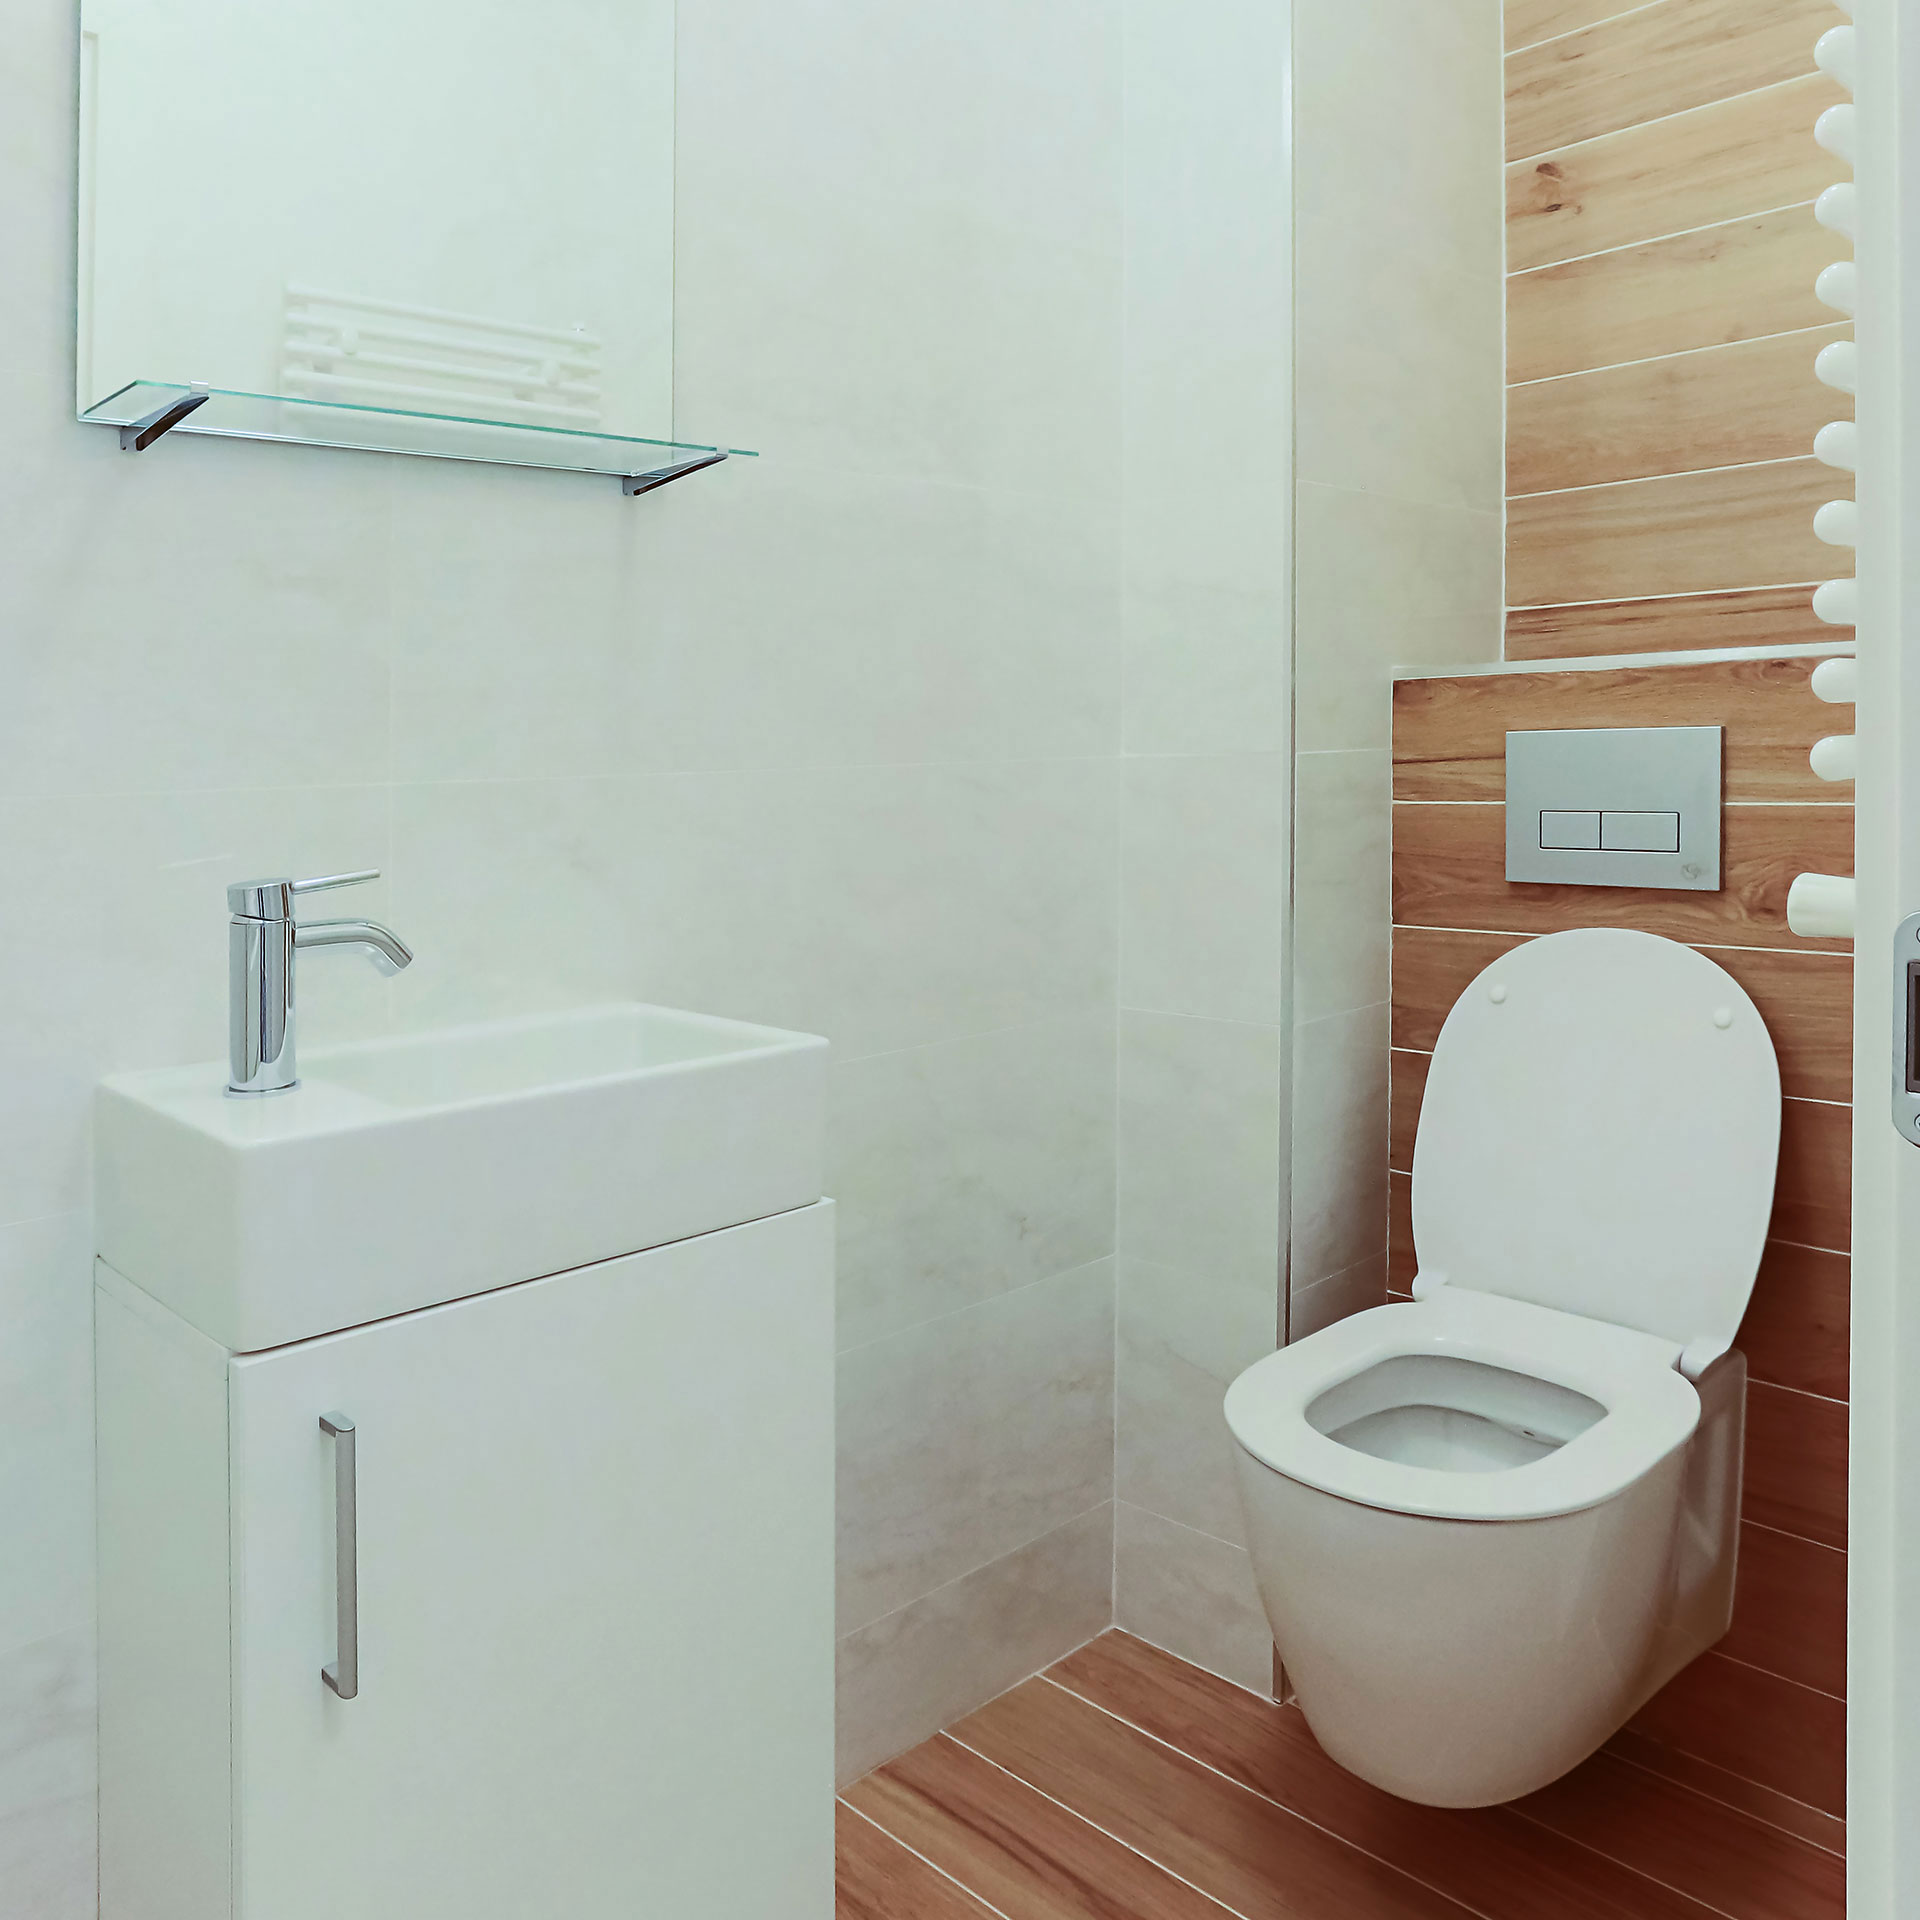 Apartamente de vanzare Bucuresti - Catedral Residence - Marriott, Piata Unirii, 13 Septembrie, Izvor - G3 - 11